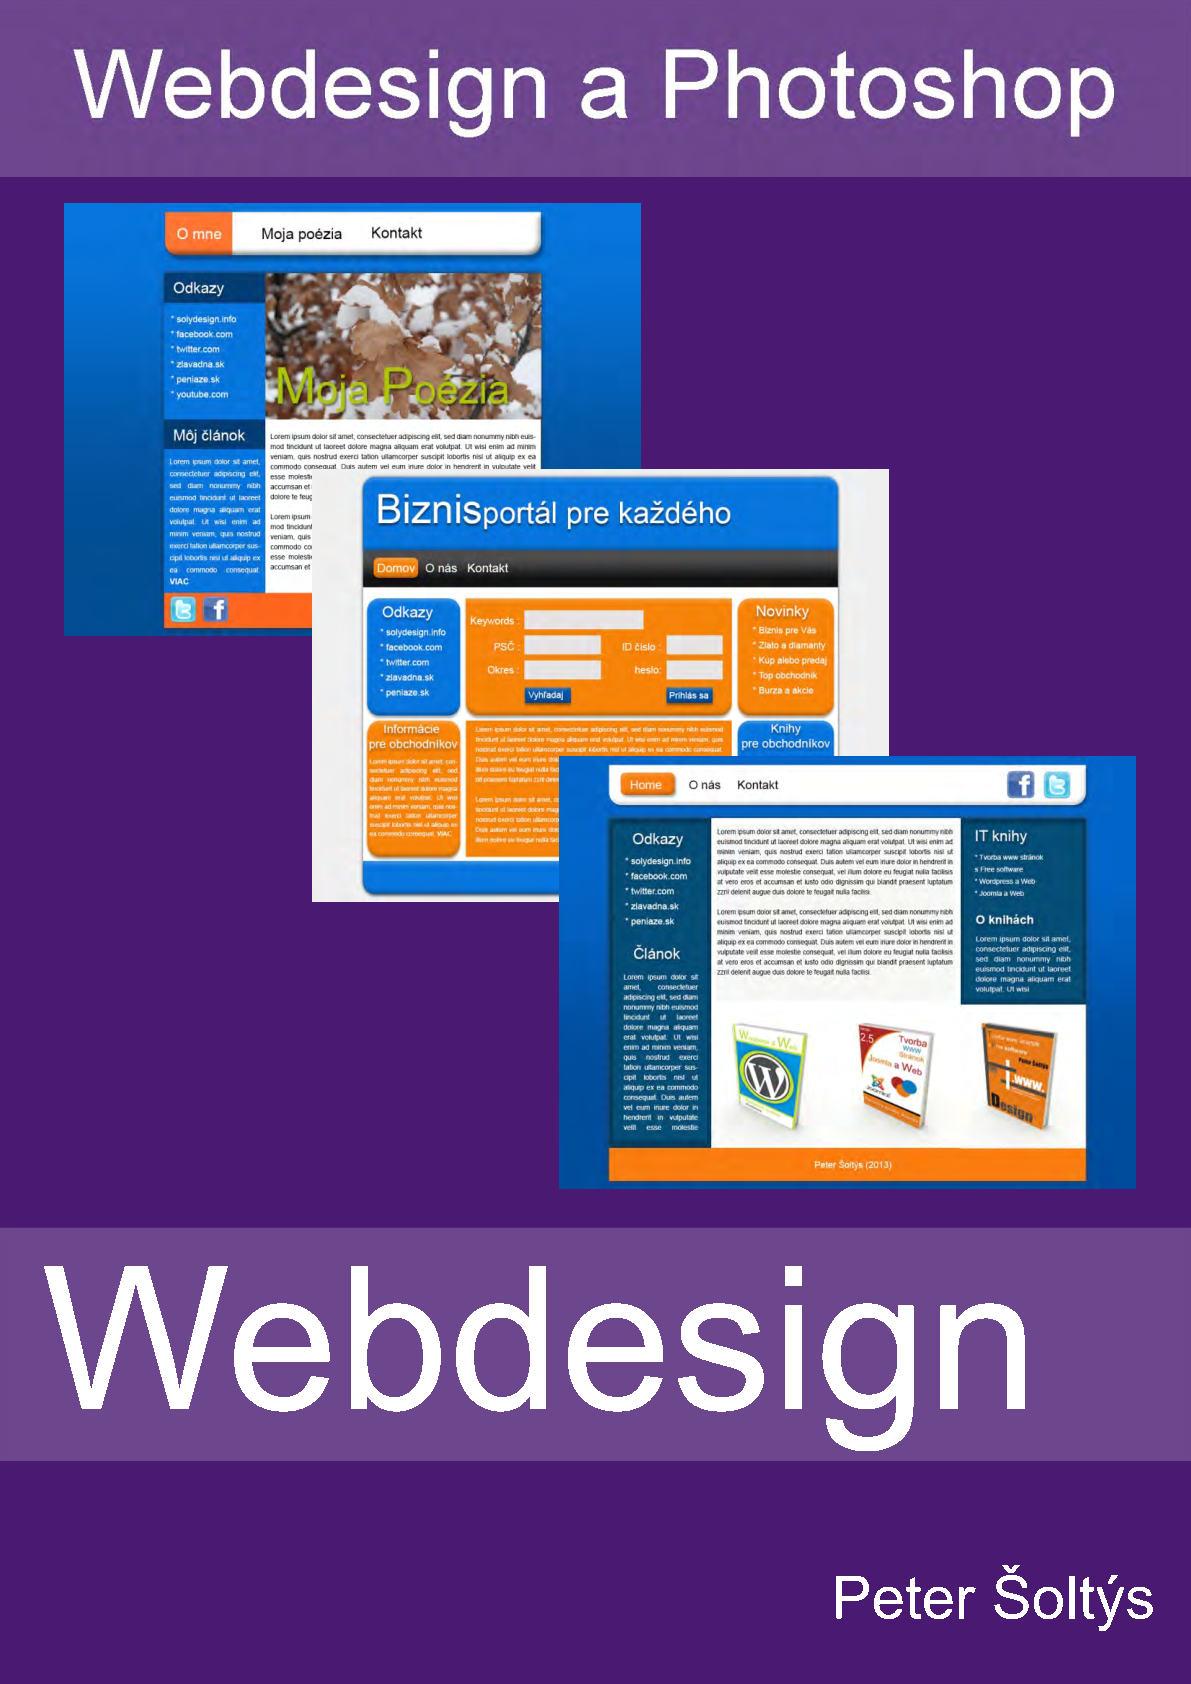 Webdesign a Photoshop